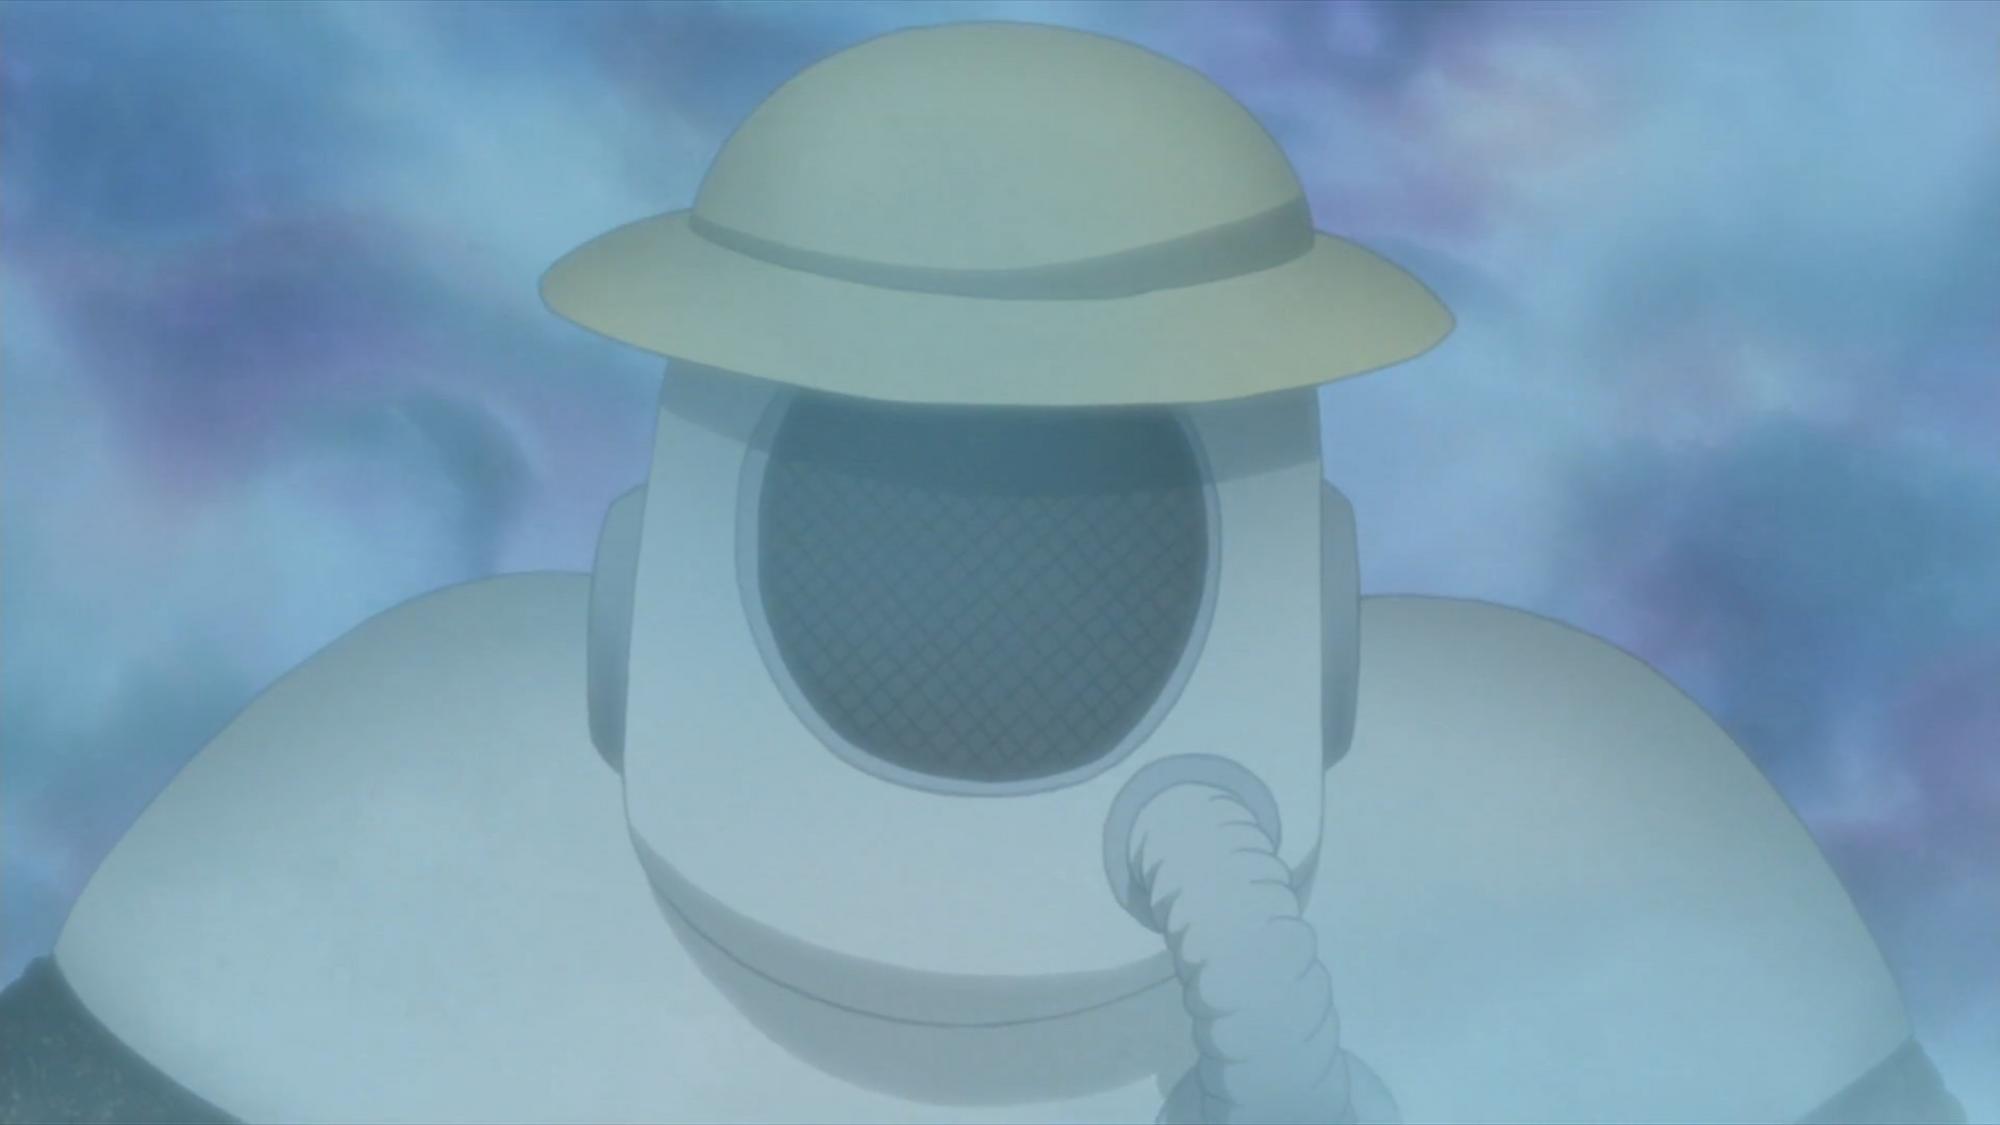 Beekeeper | Narutopedia | FANDOM powered by Wikia